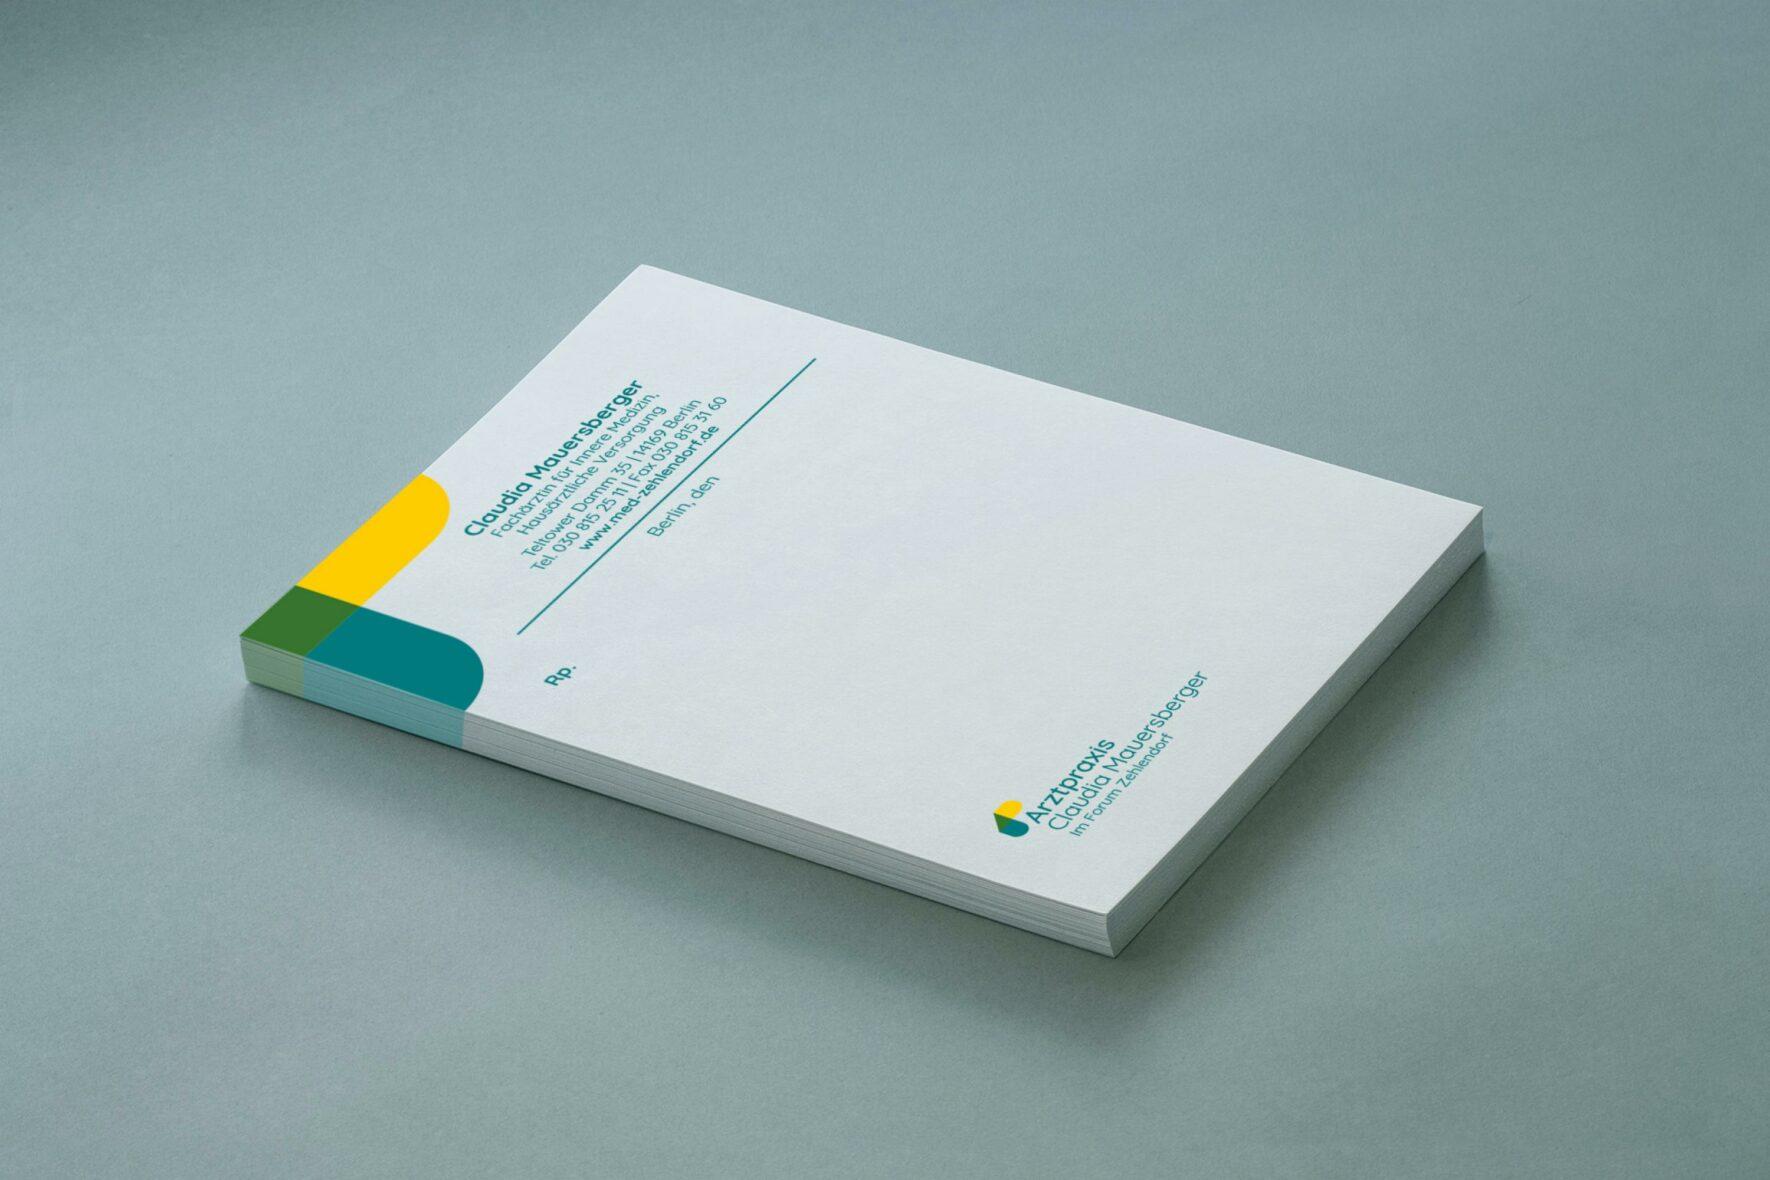 Claudia-Mauersberger-Aerztin-FORMLOS-Berlin-Gestaltung-Terminblock